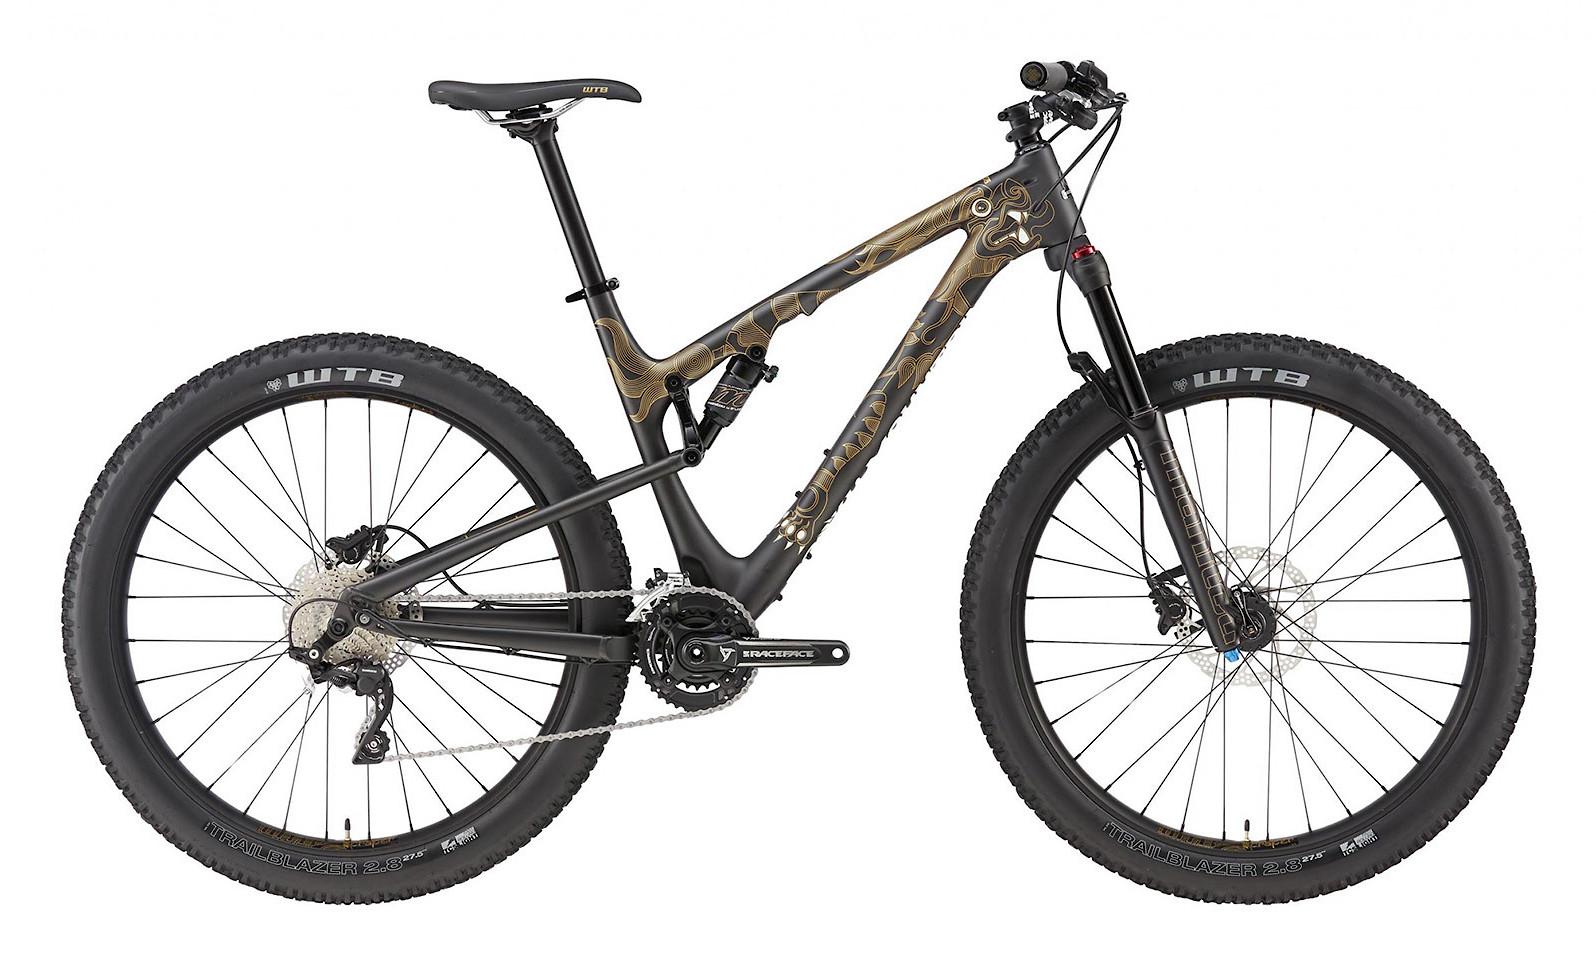 2019 Rocky Mountain Sherpa Bike